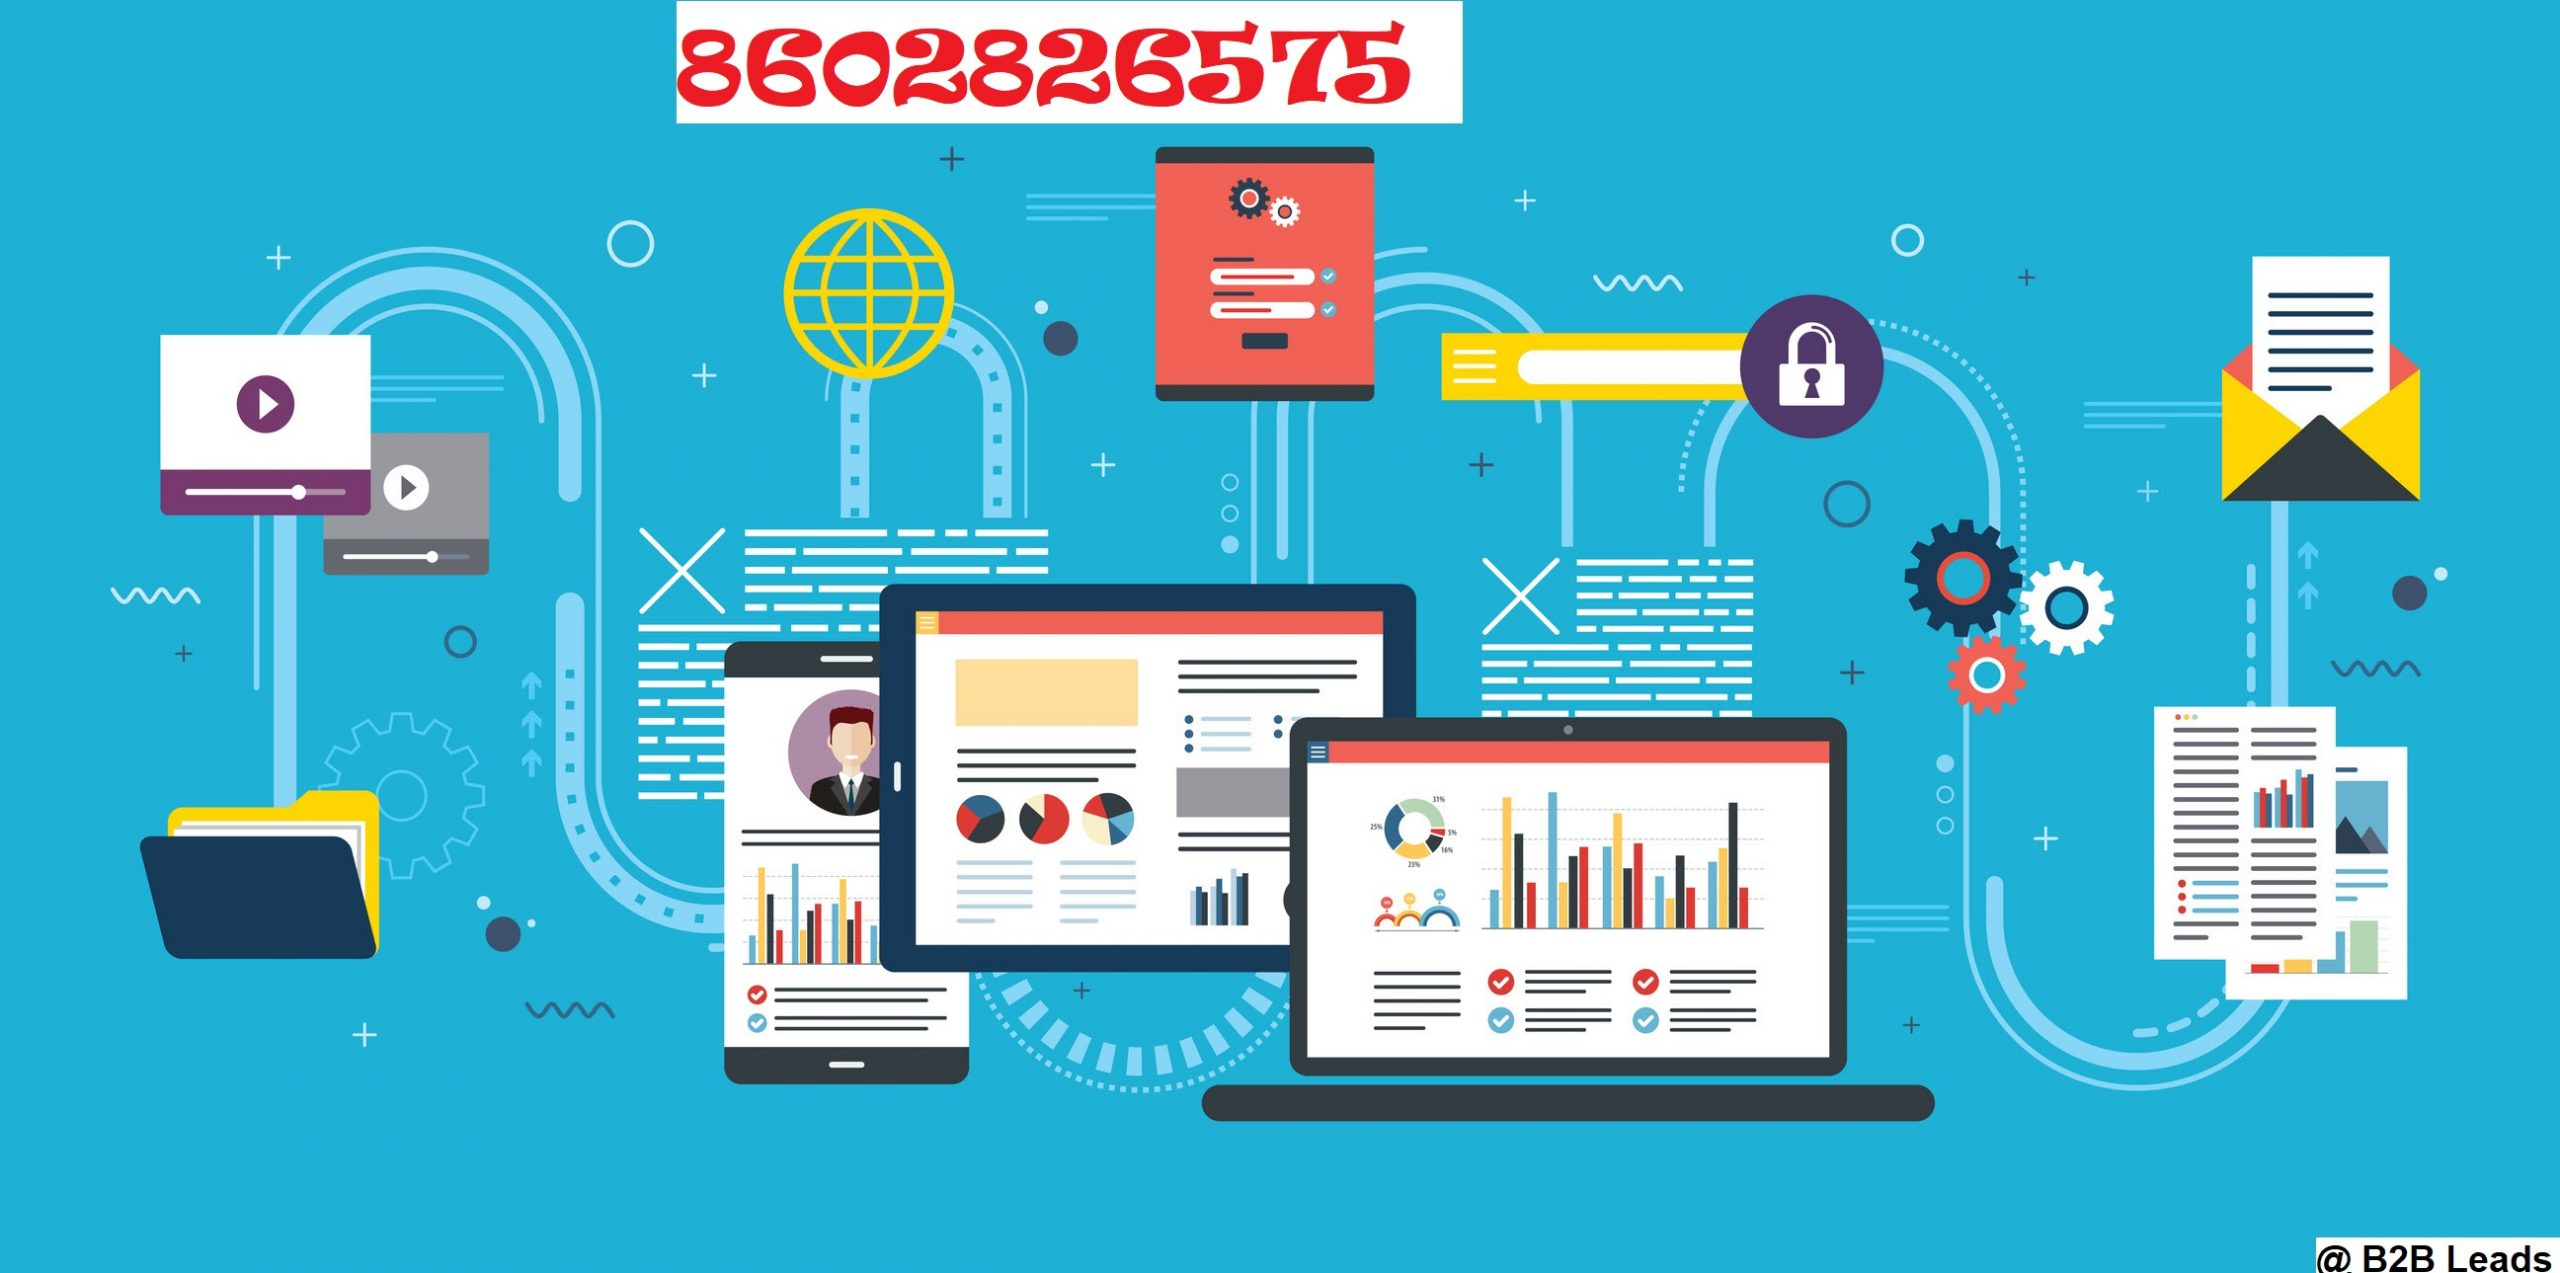 Lead Generation, Database Seller, SEO & Digital Marketing in Ratlam Madhya Pradesh